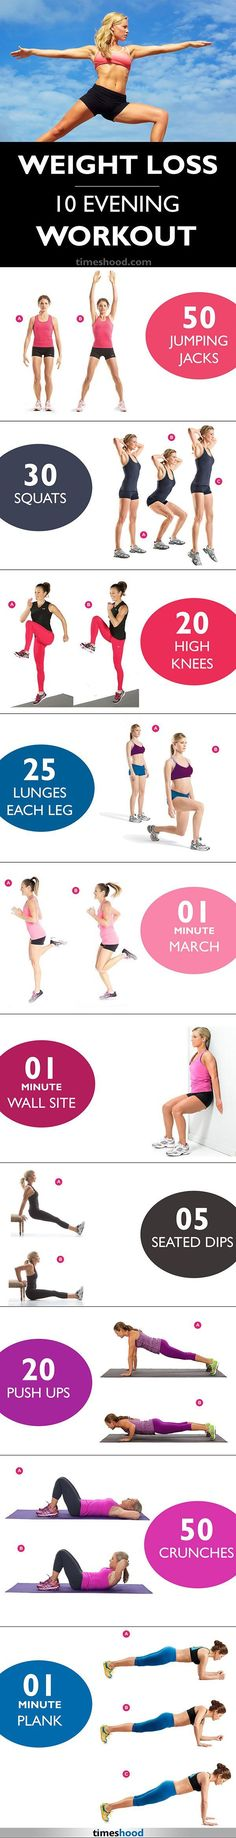 10 Effective Workout for Weight Loss. Fat Burn Evening Workout